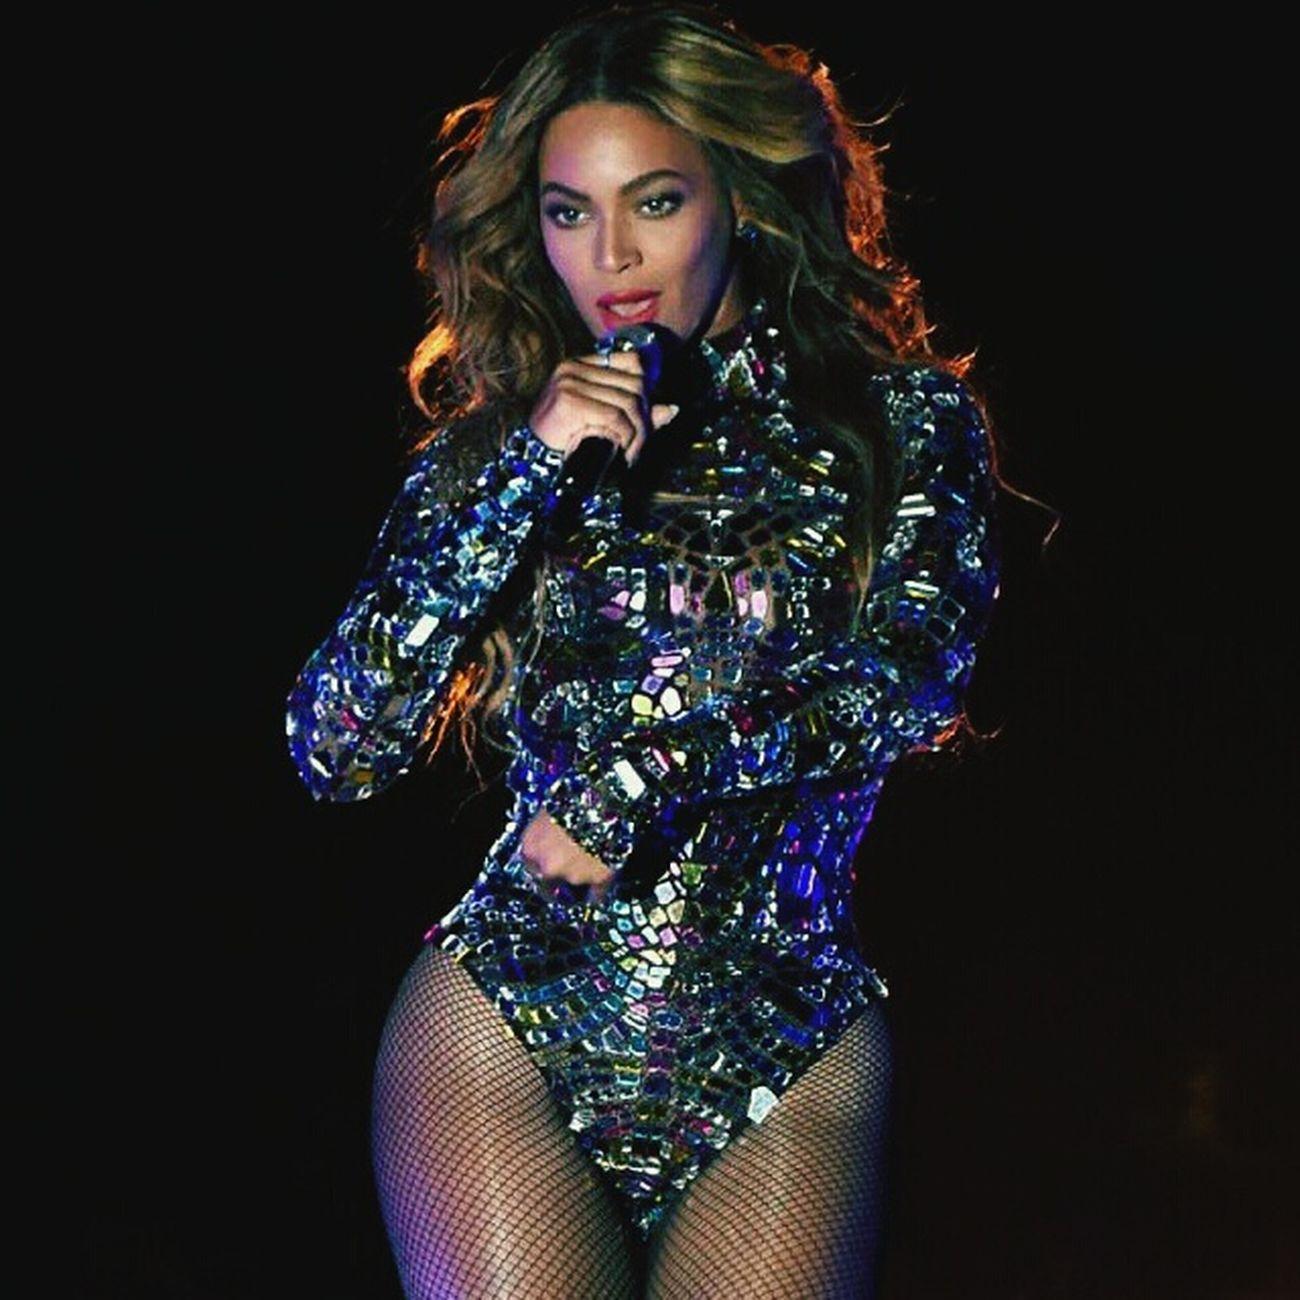 Beyonce Queen_B Vma2014 Yonce ❤